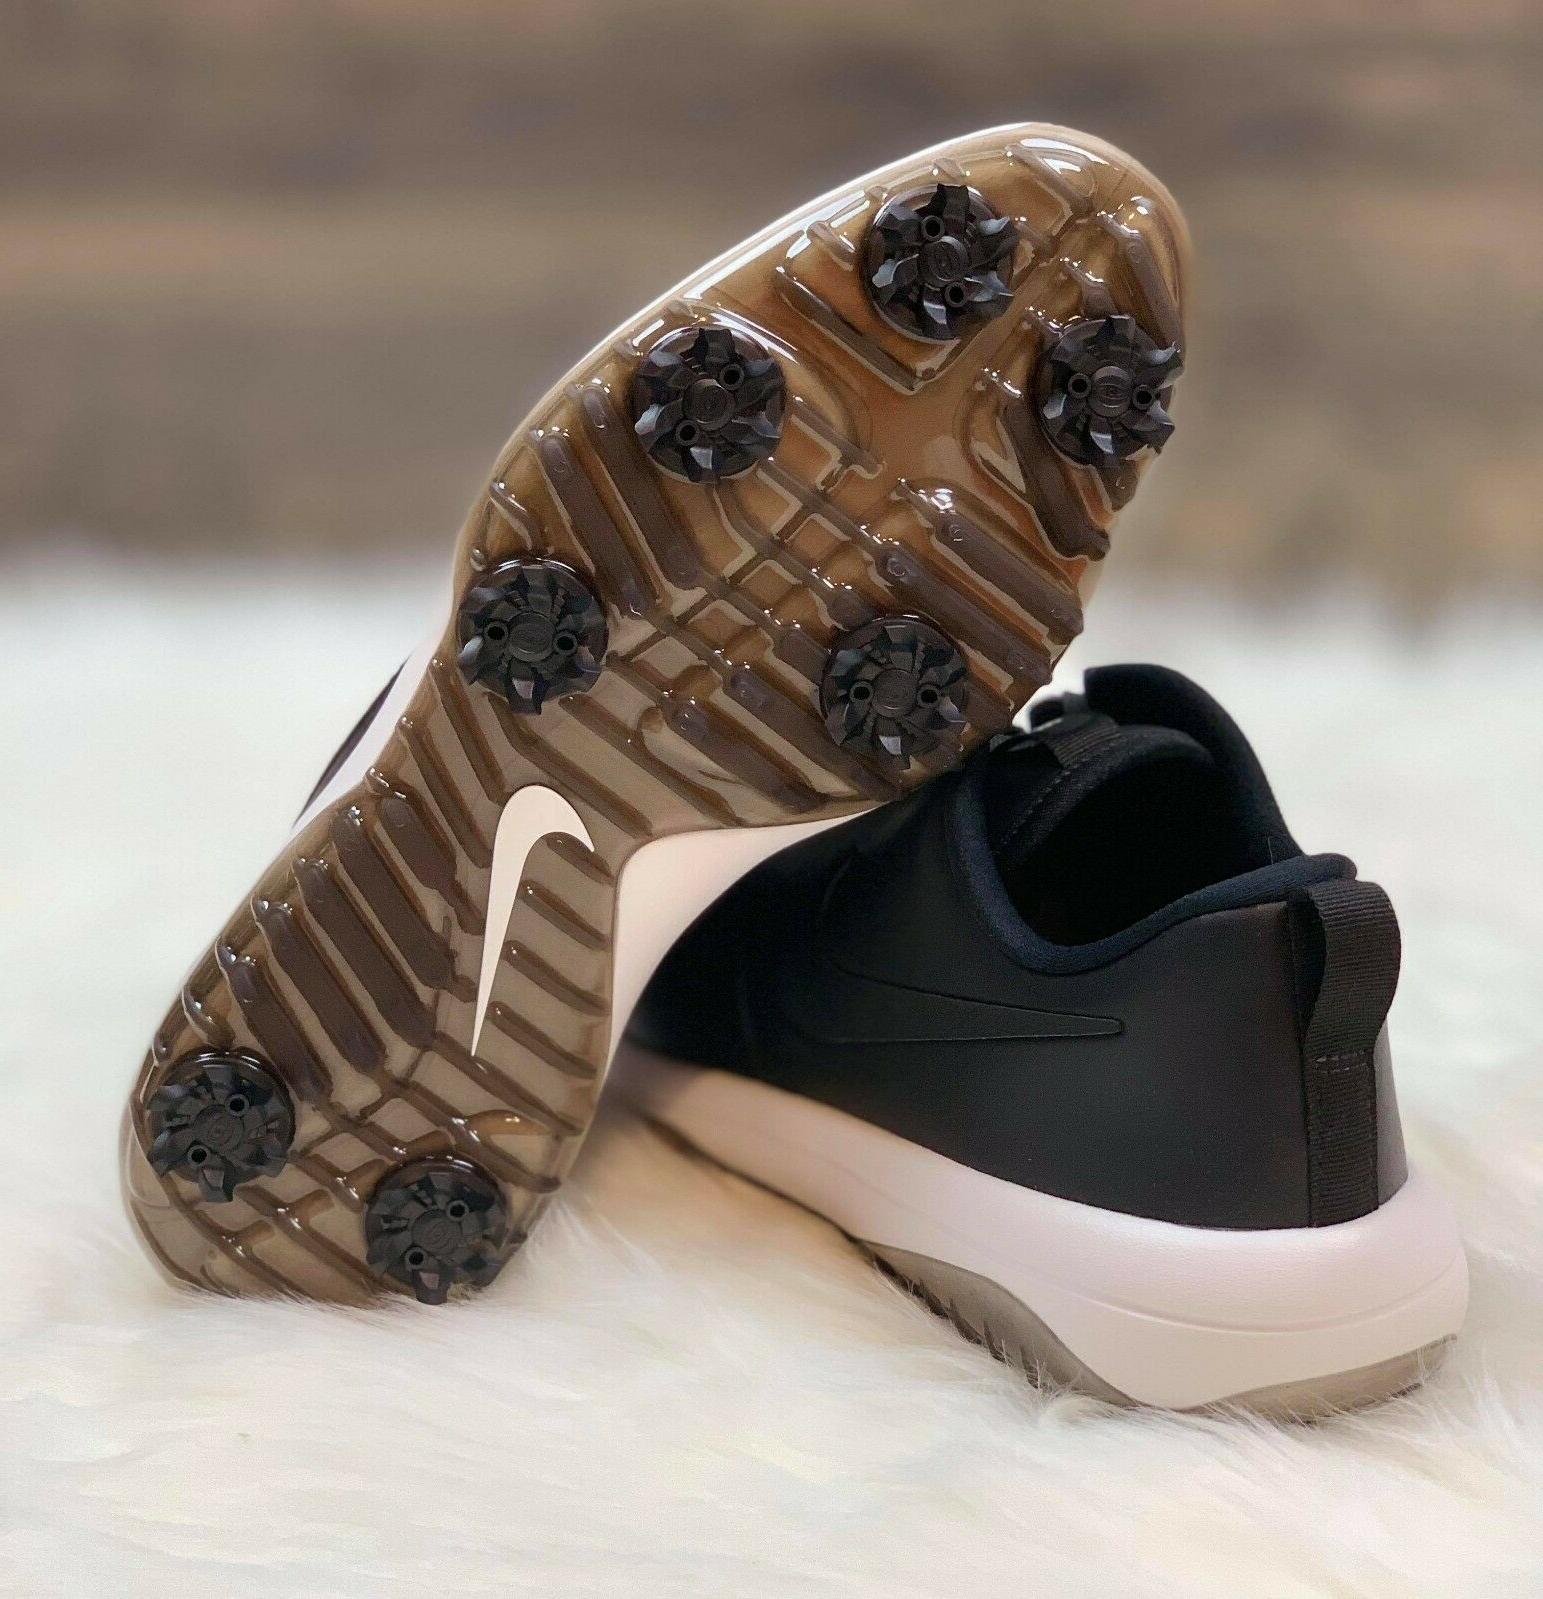 Nike Golf Shoes Cleats PGA tour Mens AR5580-001